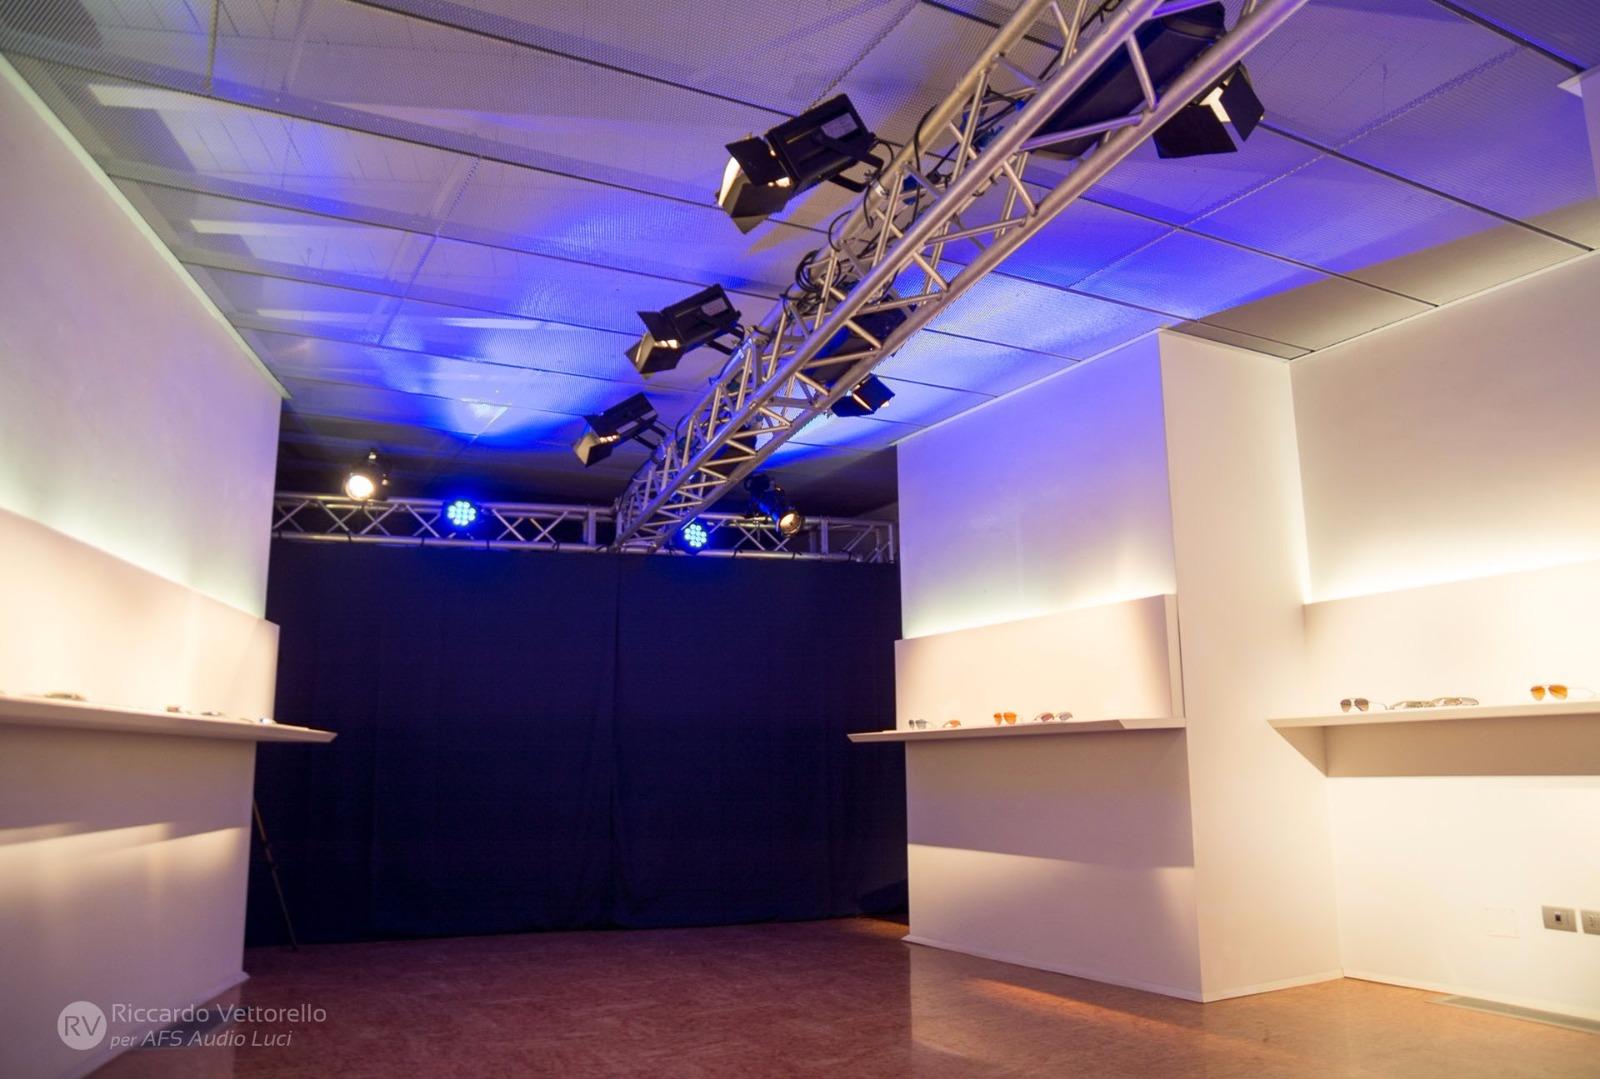 Mostre ed esposizioni u2013 afs service audio e luci venezia